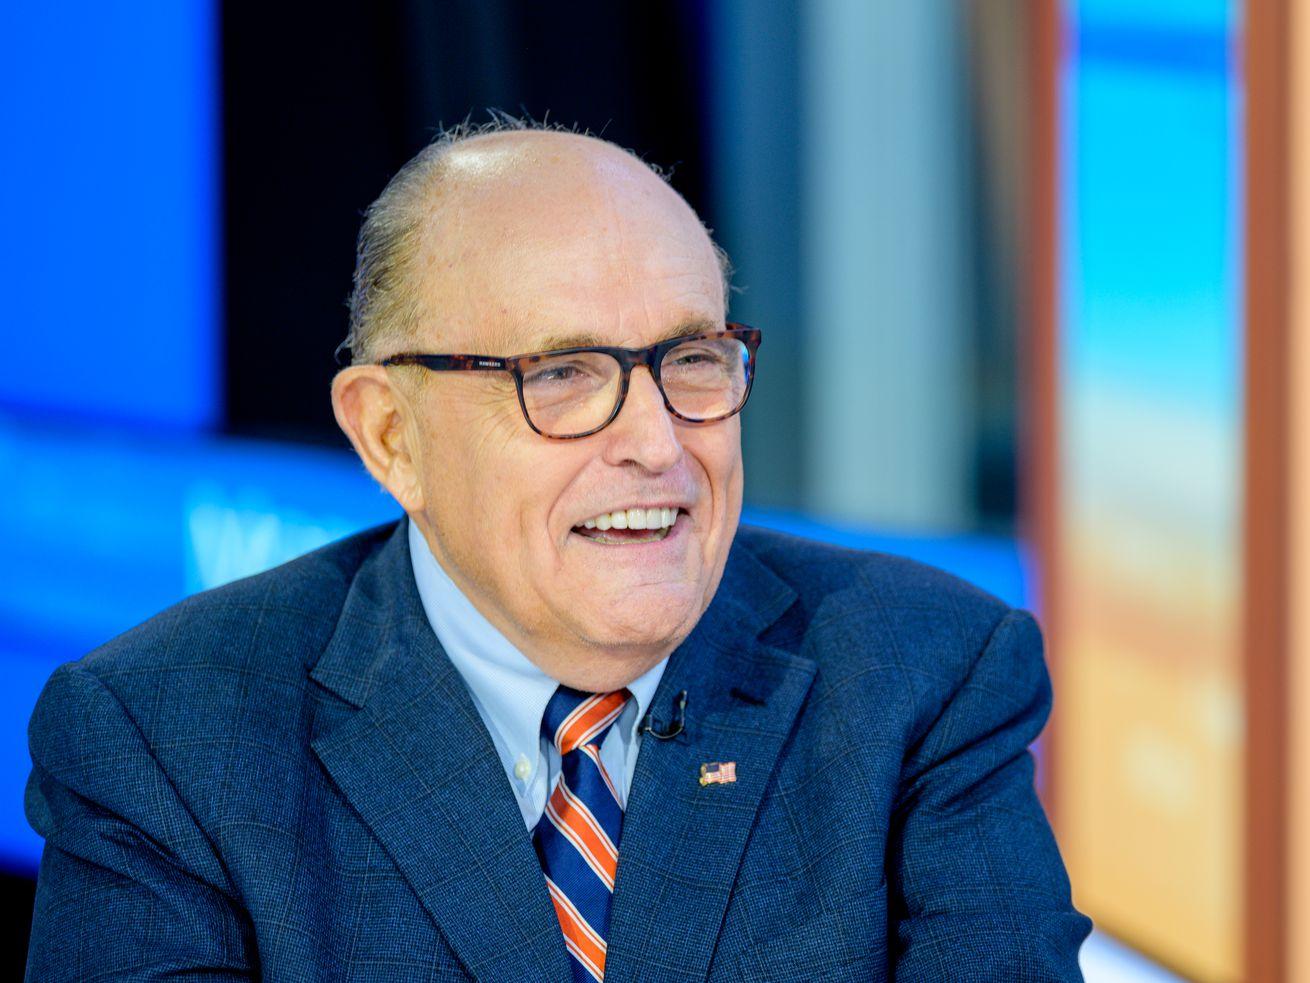 Former New York City mayor and attorney to President Donald Trump Rudy Giuliani.